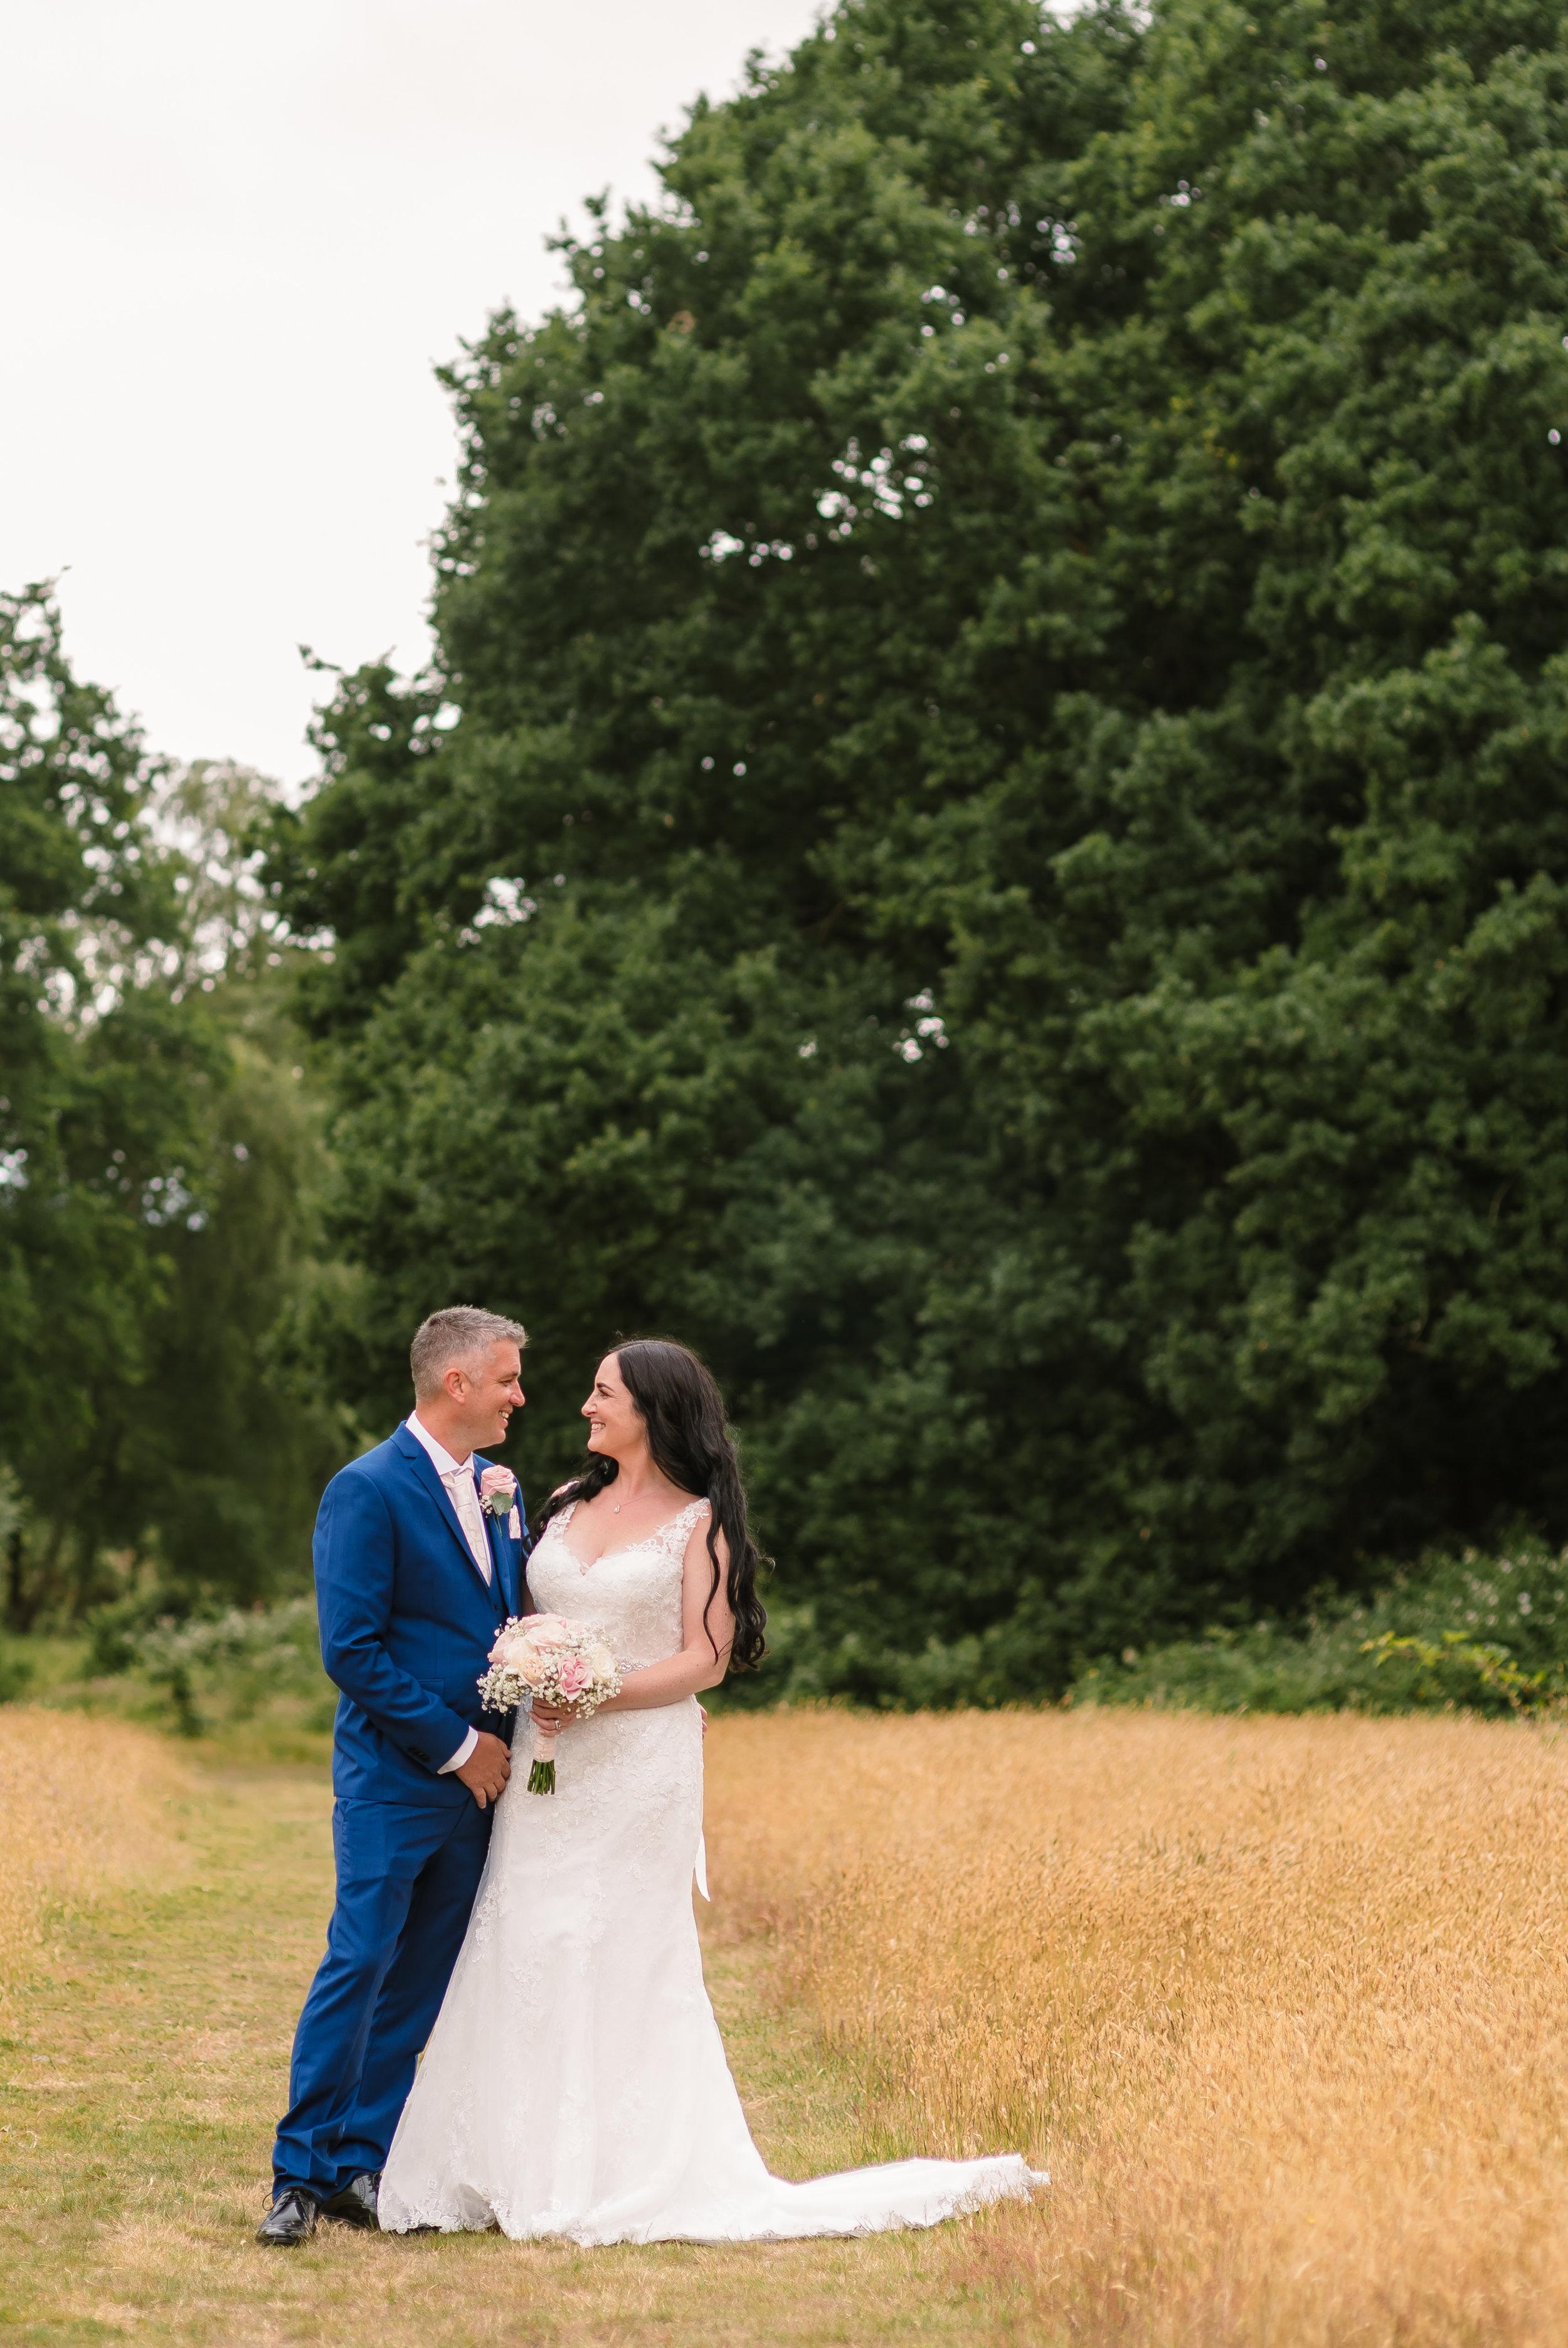 Sarah-Fishlock-Photography : Hampshire-wedding-photographer-hampshire : fleet-wedding-photographer-fleet : Meade-Hall-Wedding-Photographer : Meade-Hall-Wedding-Photos-755.jpg